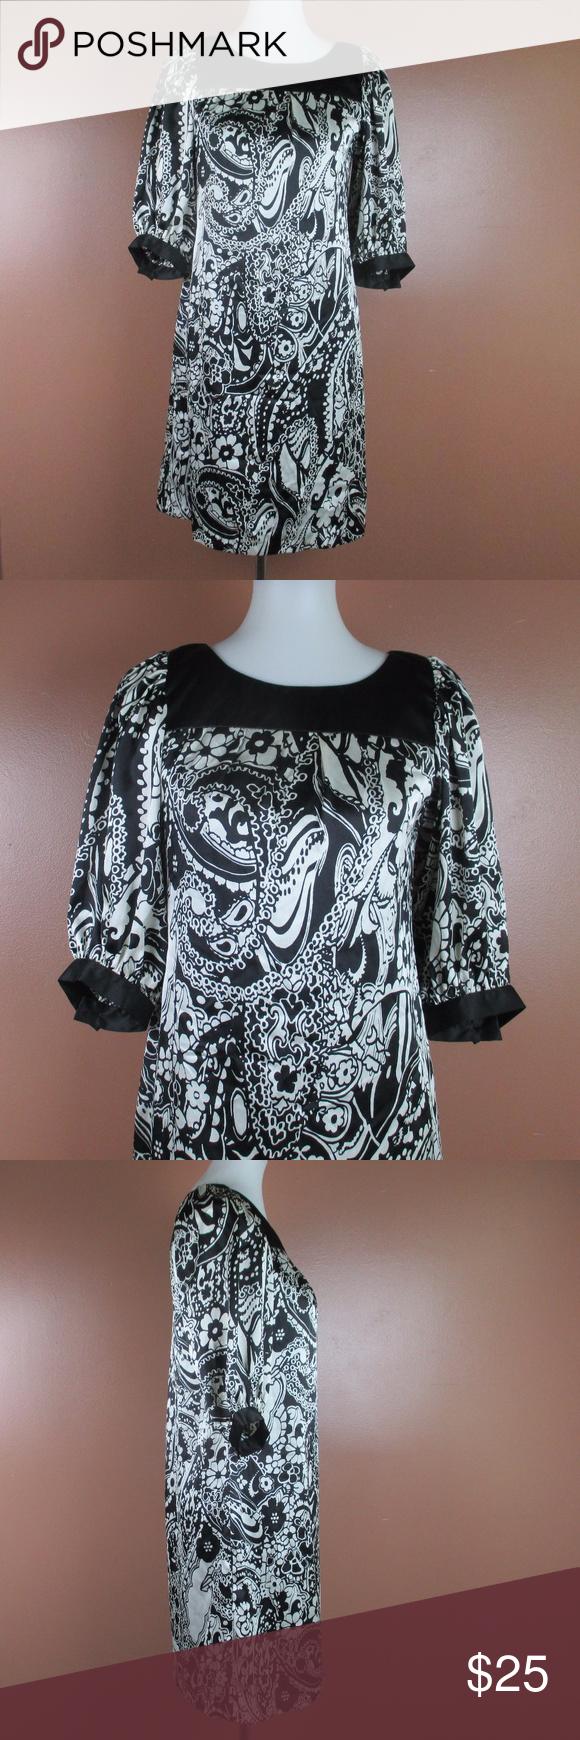 dressbarn dress tunic paisley black white paisley print and tunics